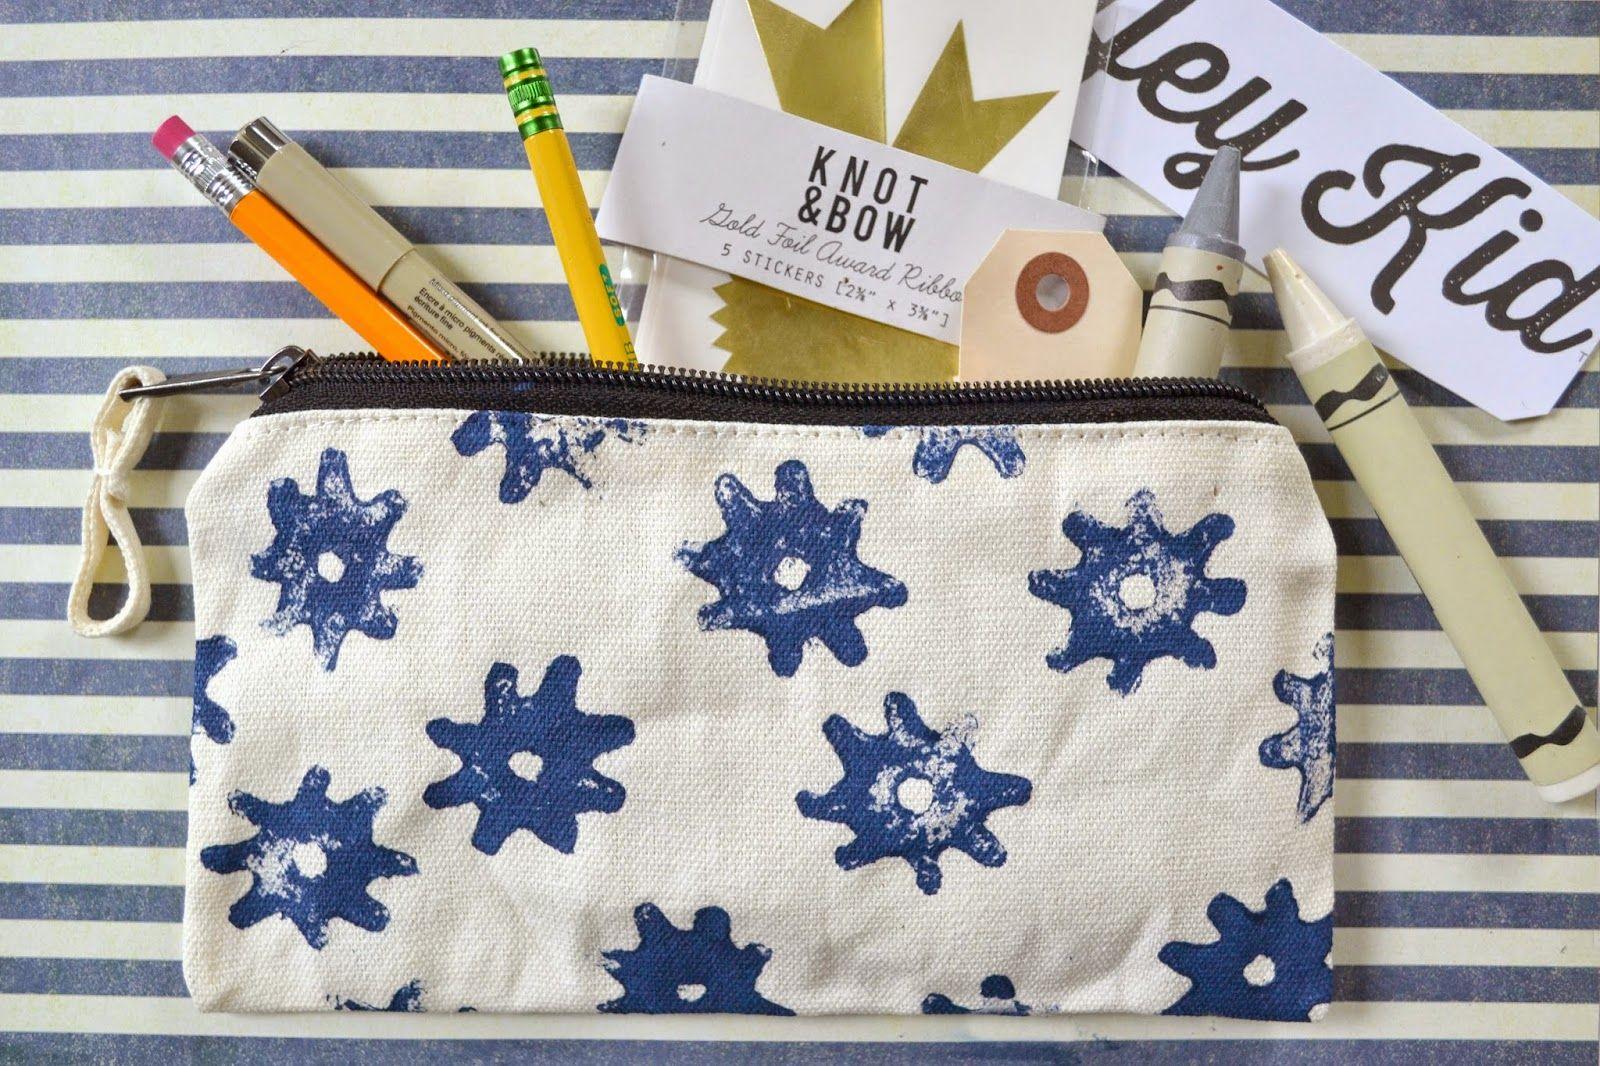 Attic lace stamp it personalized pencil case